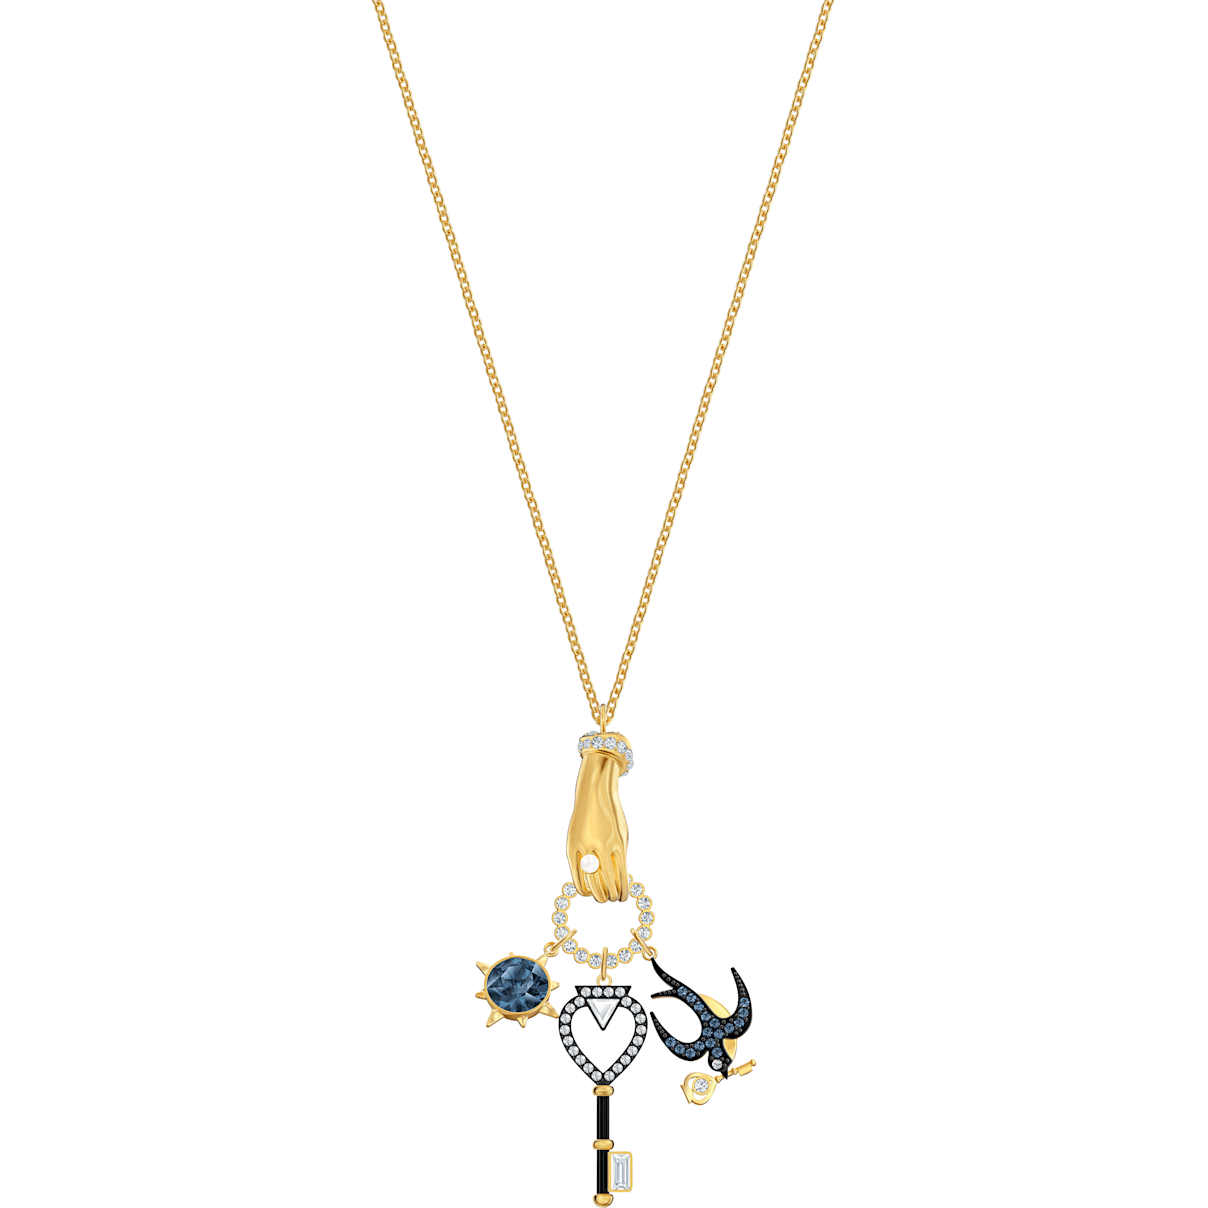 Swarovski Tarot Magic Charm Pendant, Multi-colored, Gold-tone plated